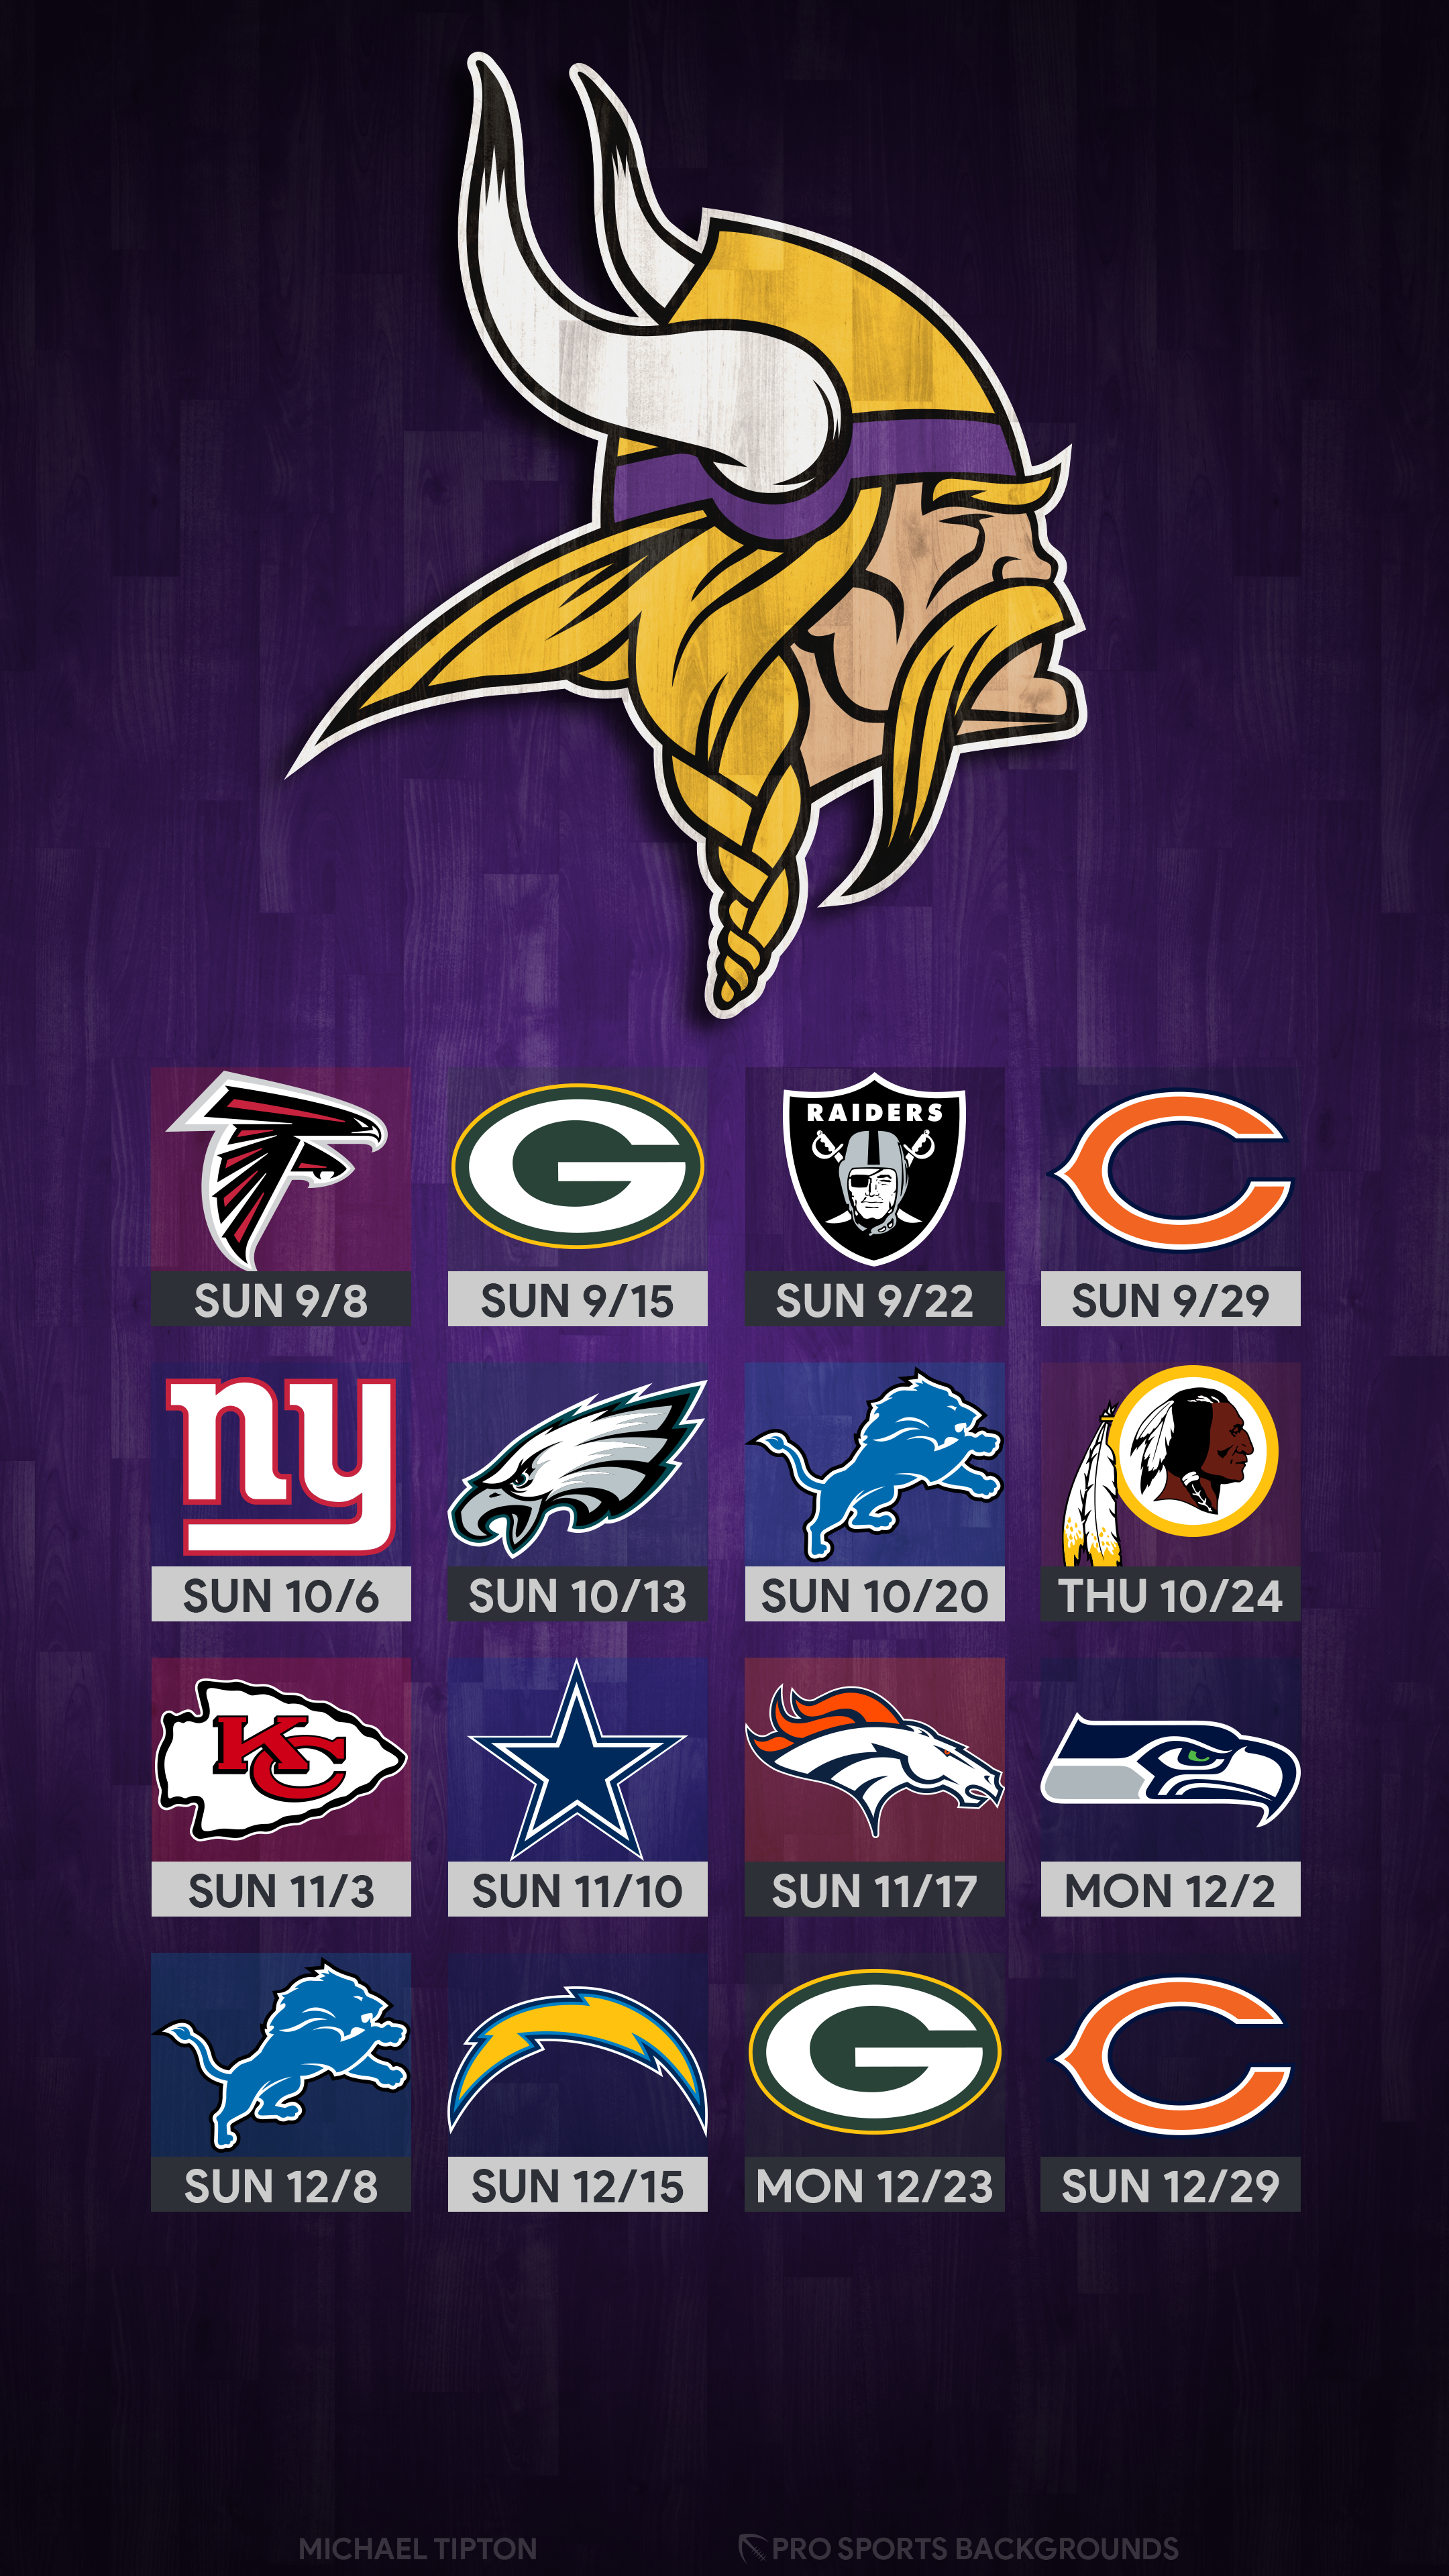 photograph about Minnesota Vikings Printable Schedule named 40+] Minnesota Vikings 2019 Wallpapers upon WallpaperSafari